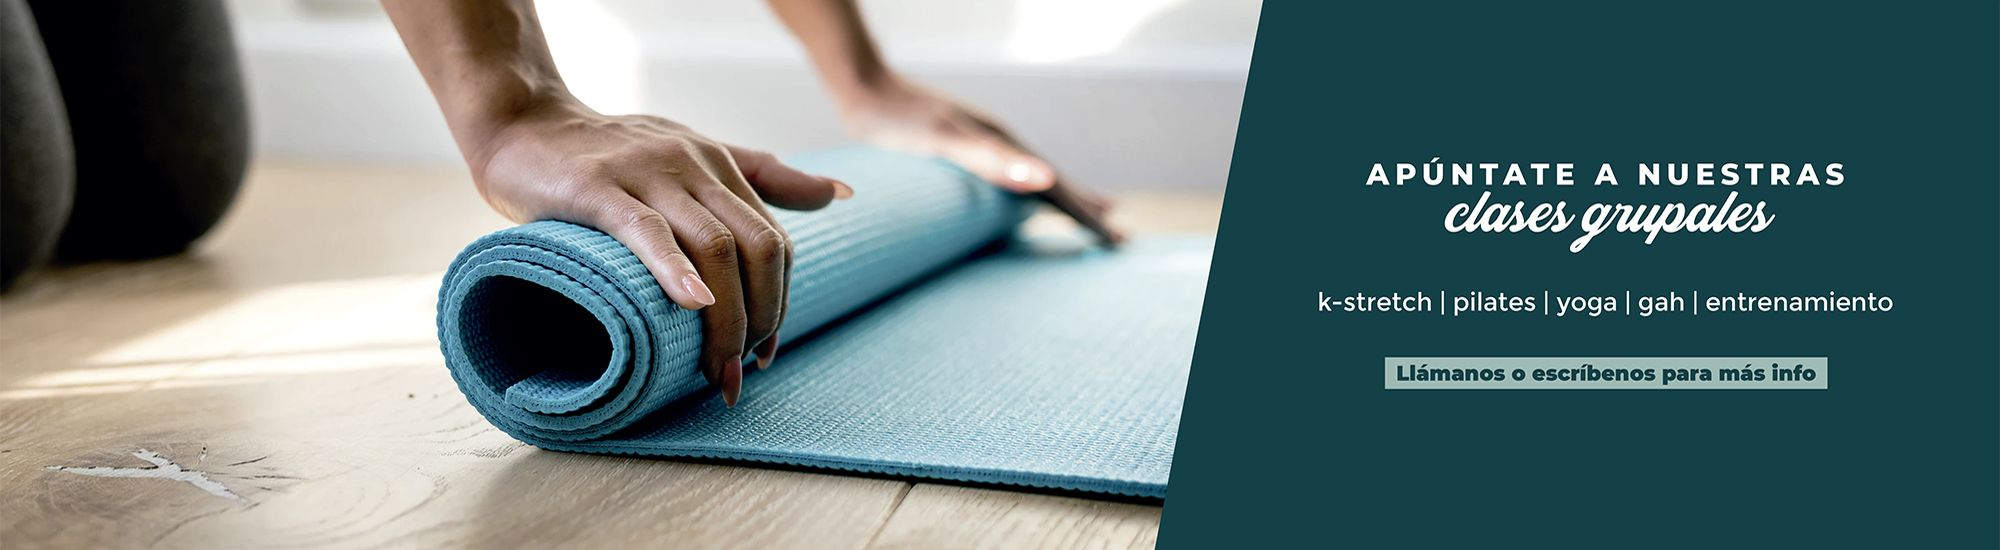 slider clases grupales pilates yoga kstretch gah fisioclinics bilbao